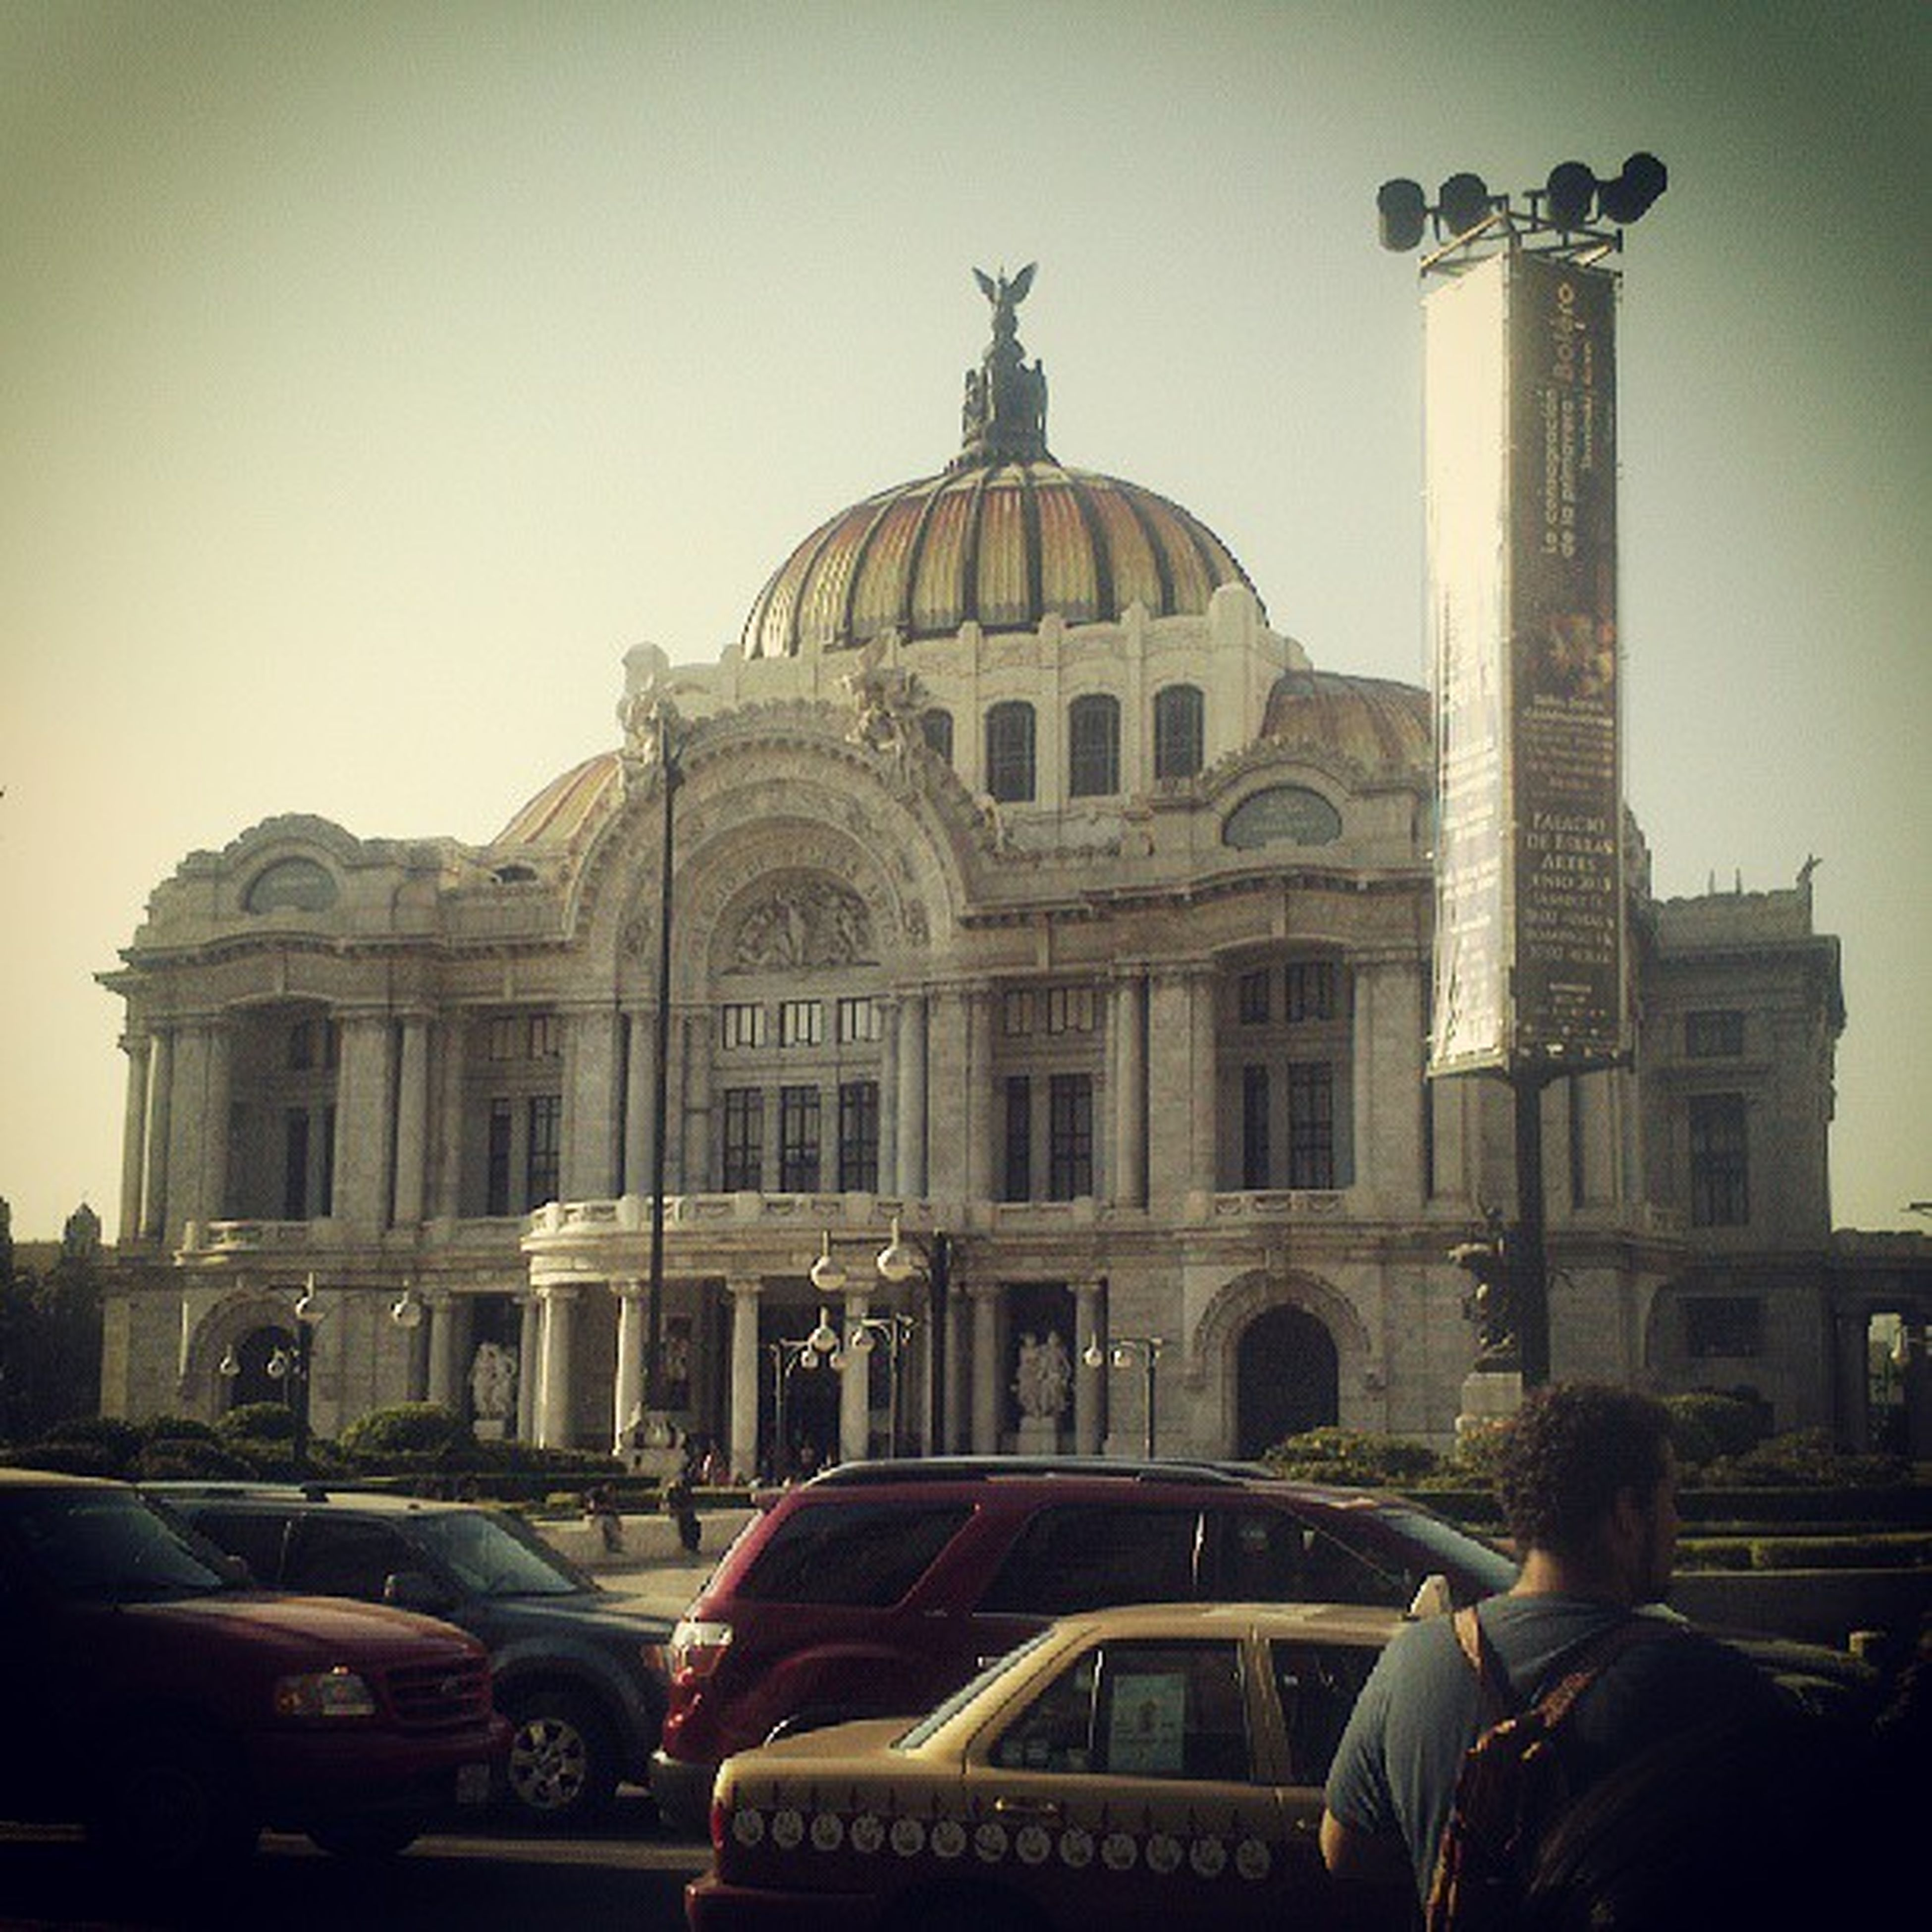 Palaciodelarte Centro Df Mexico